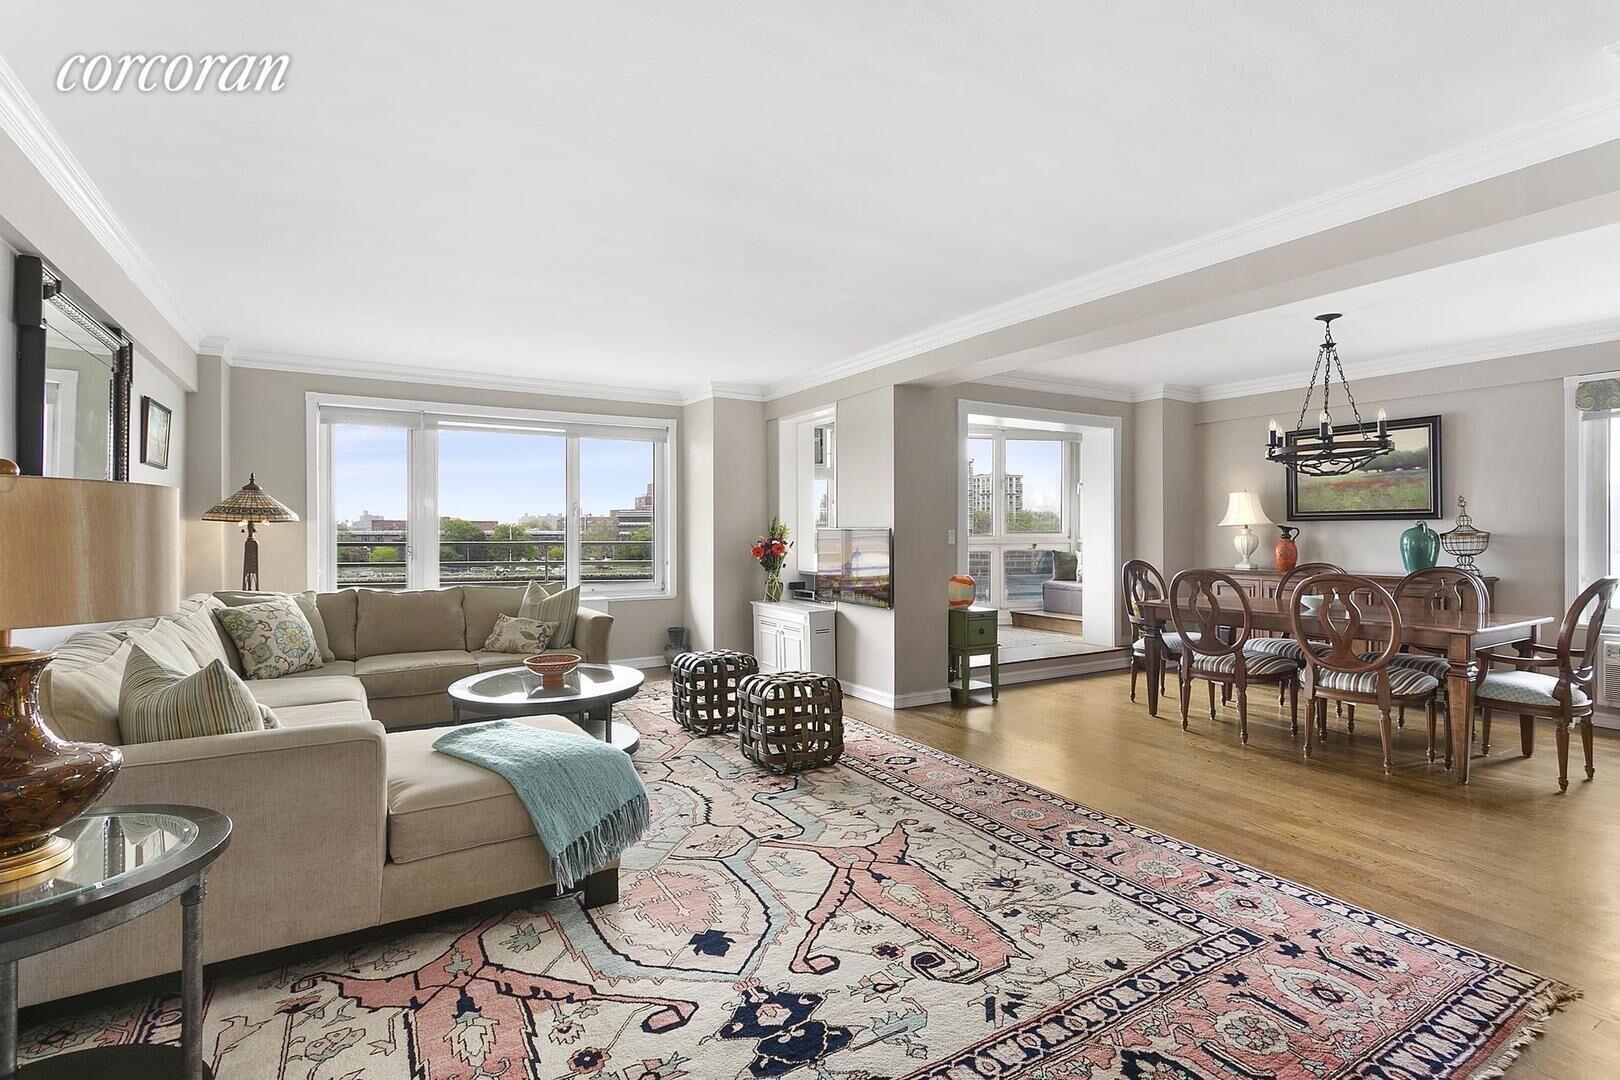 Apartment for sale at 1 Gracie Terrace, Apt 2D